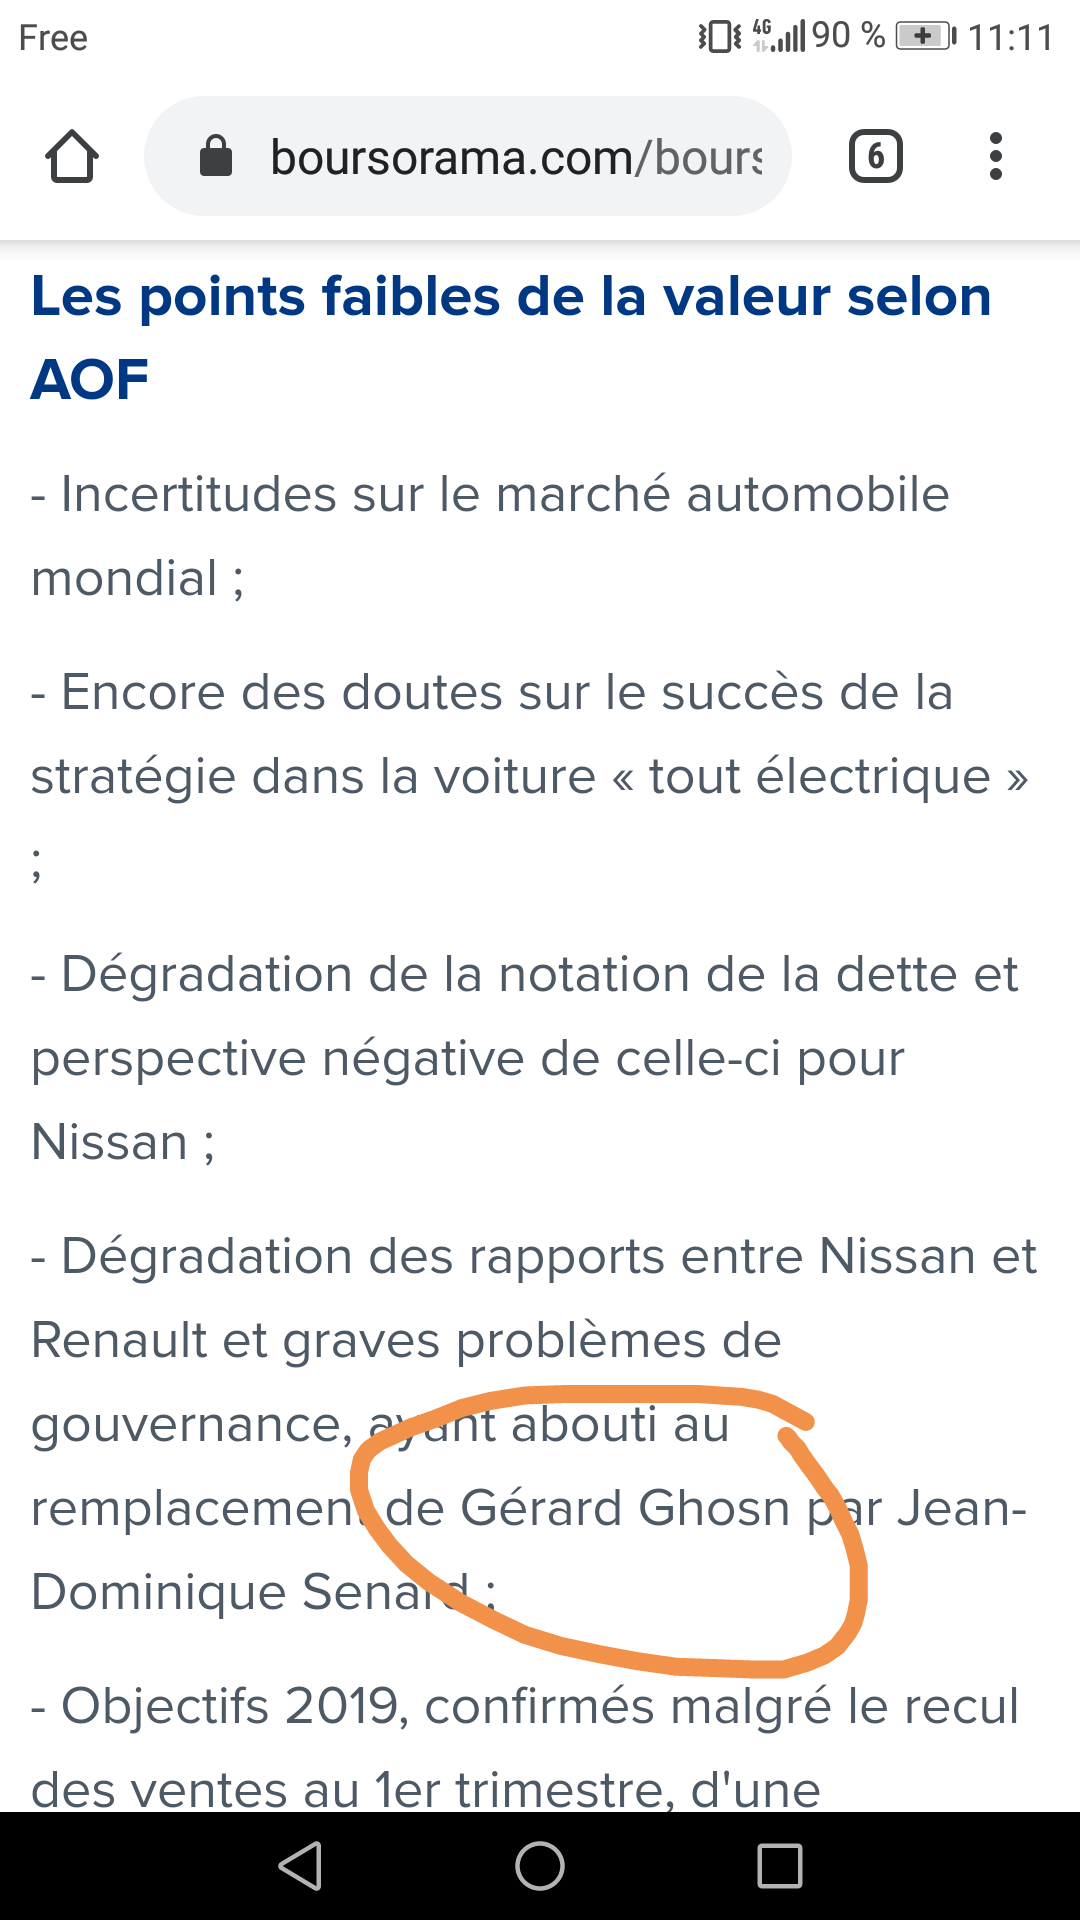 [Actualité] Alliance Renault-Nissan-Mitsubishi - Page 17 Img_2035